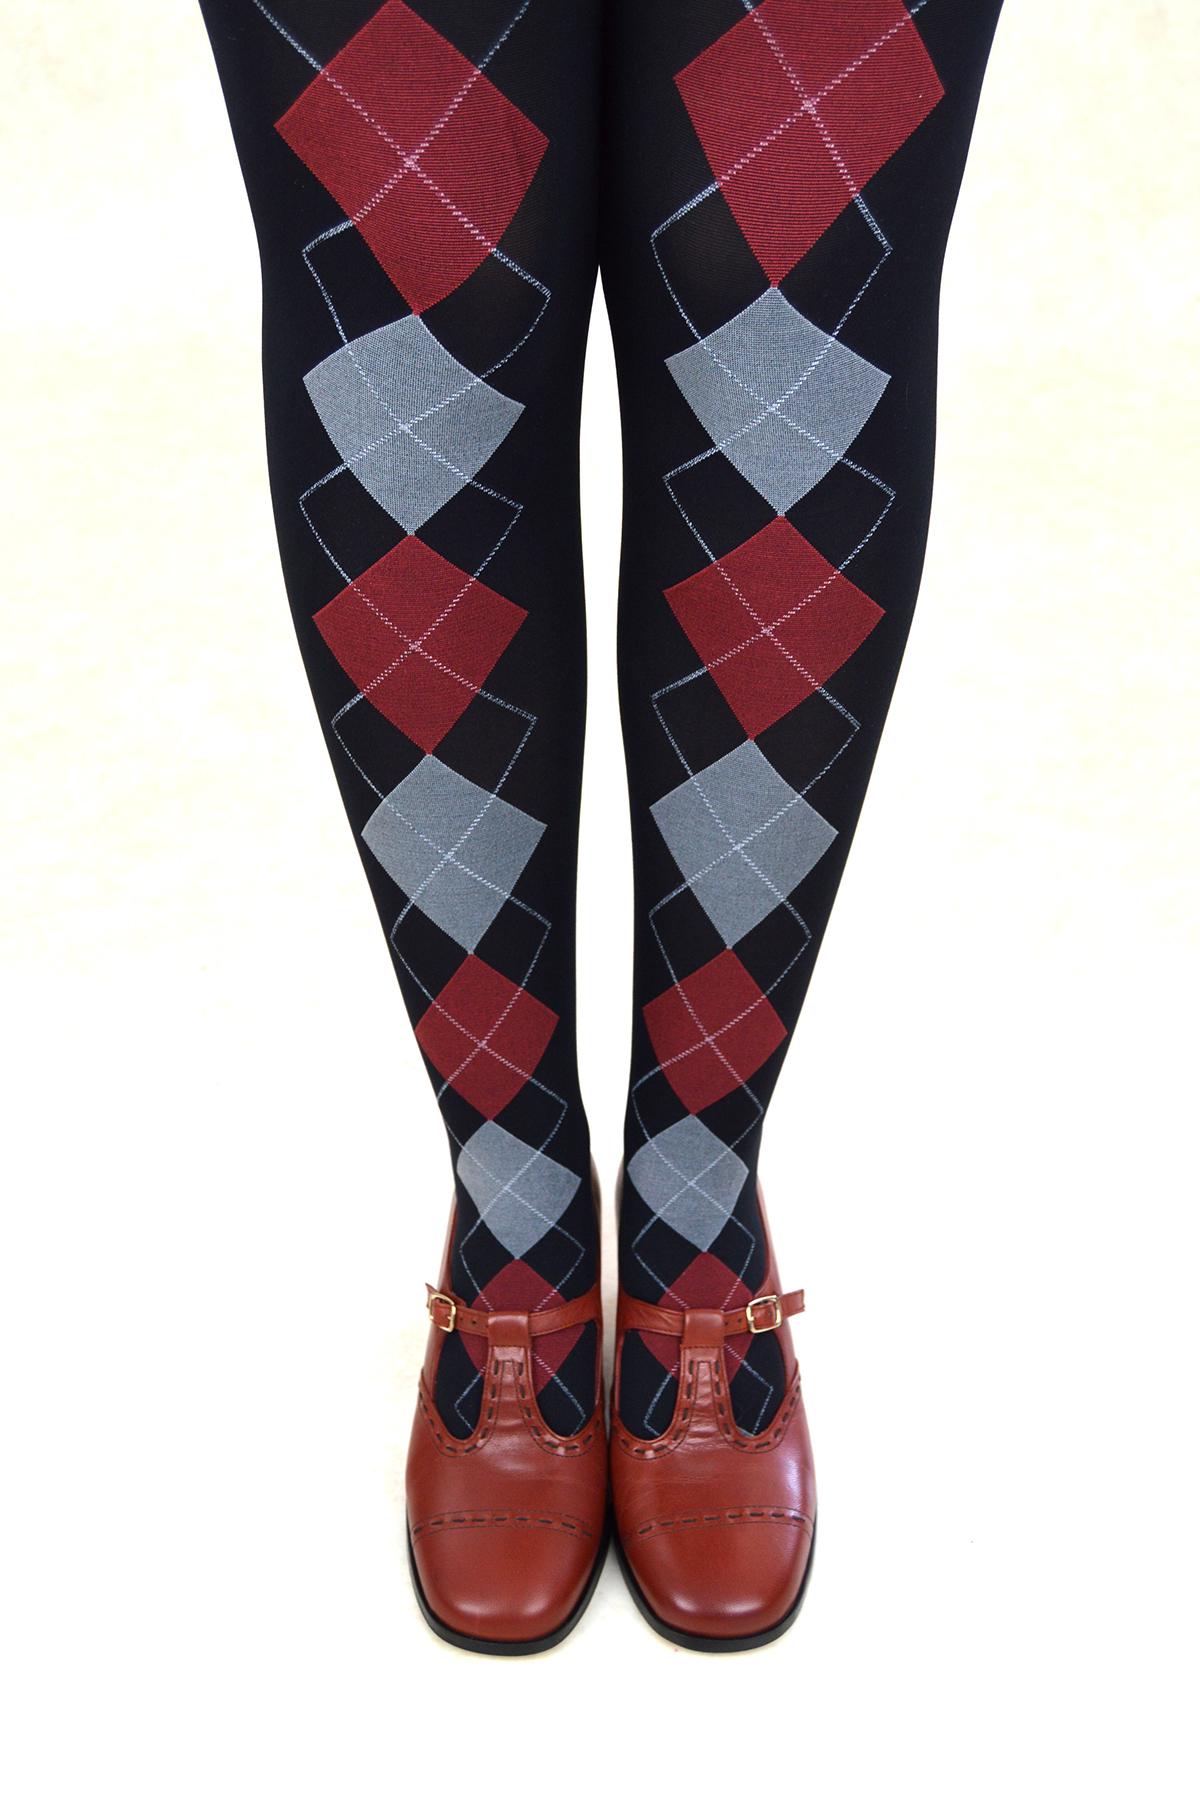 2bb8894867ad Black & Burgundy Argyle Pattern Tights – ladies vintage retro 60s ...